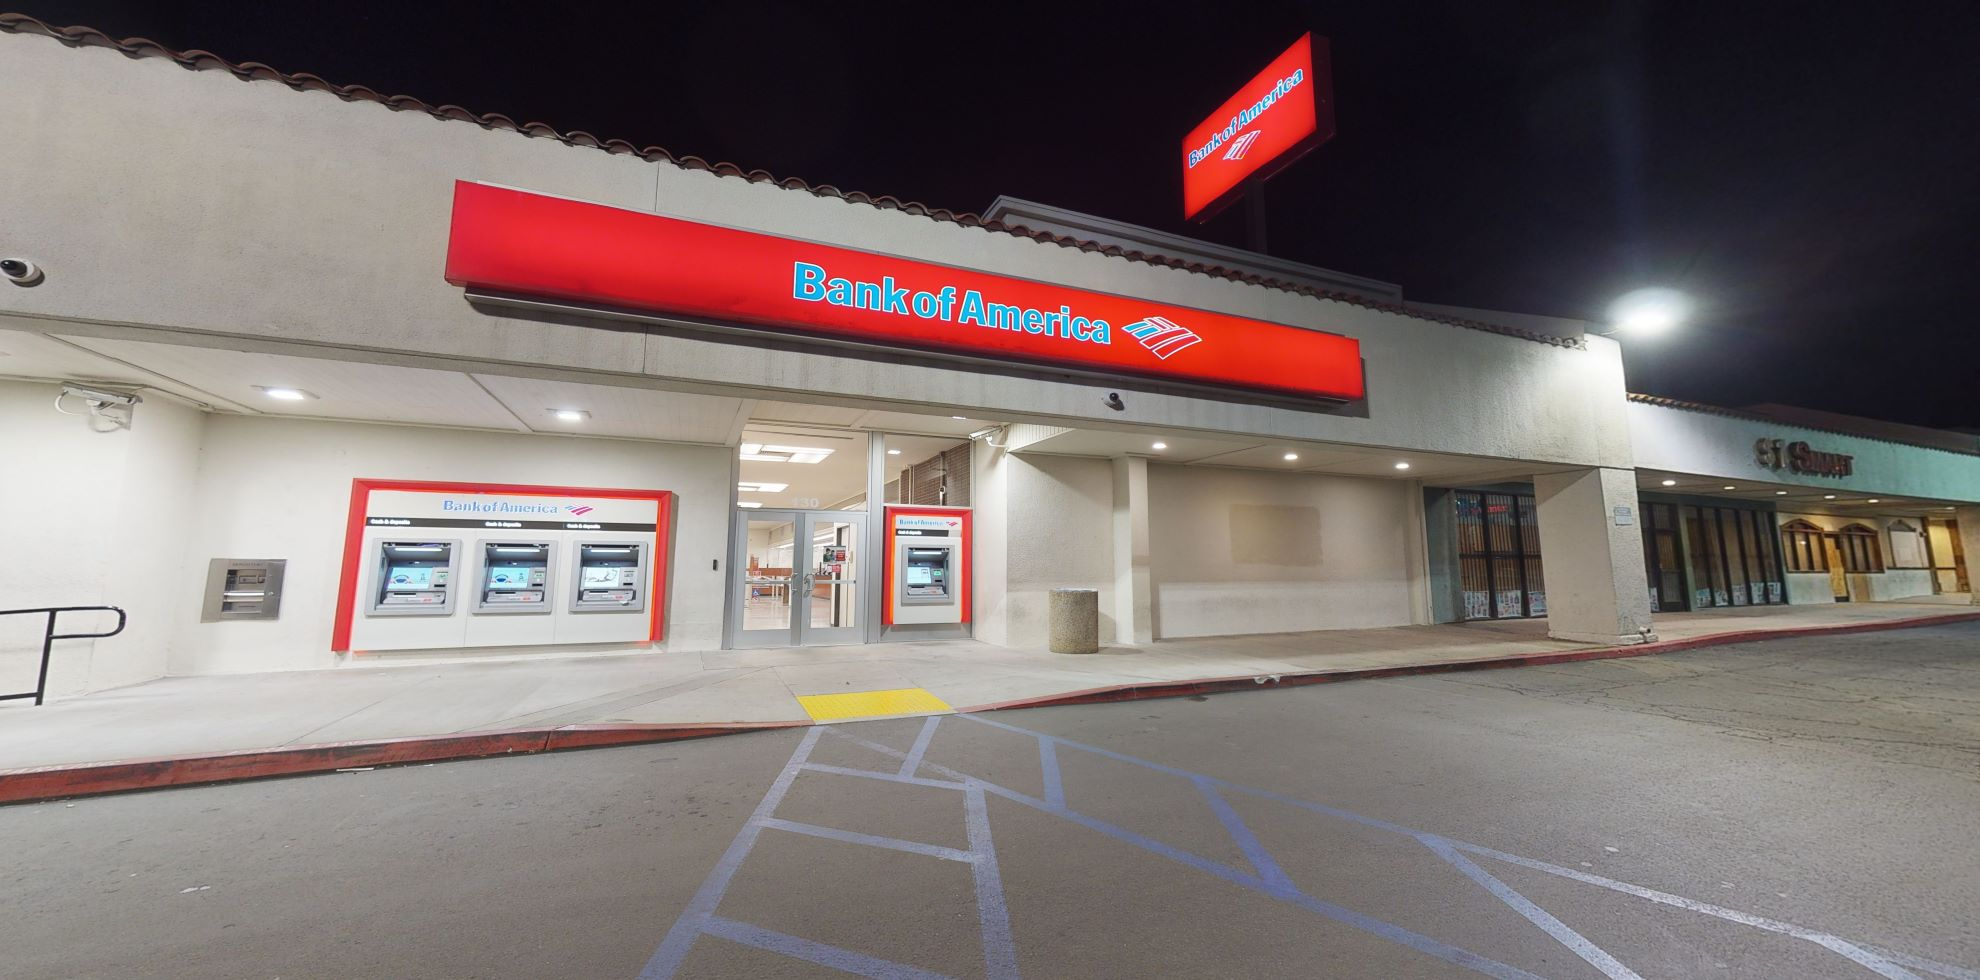 Bank of America financial center with walk-up ATM   130 W 40th St, San Bernardino, CA 92407